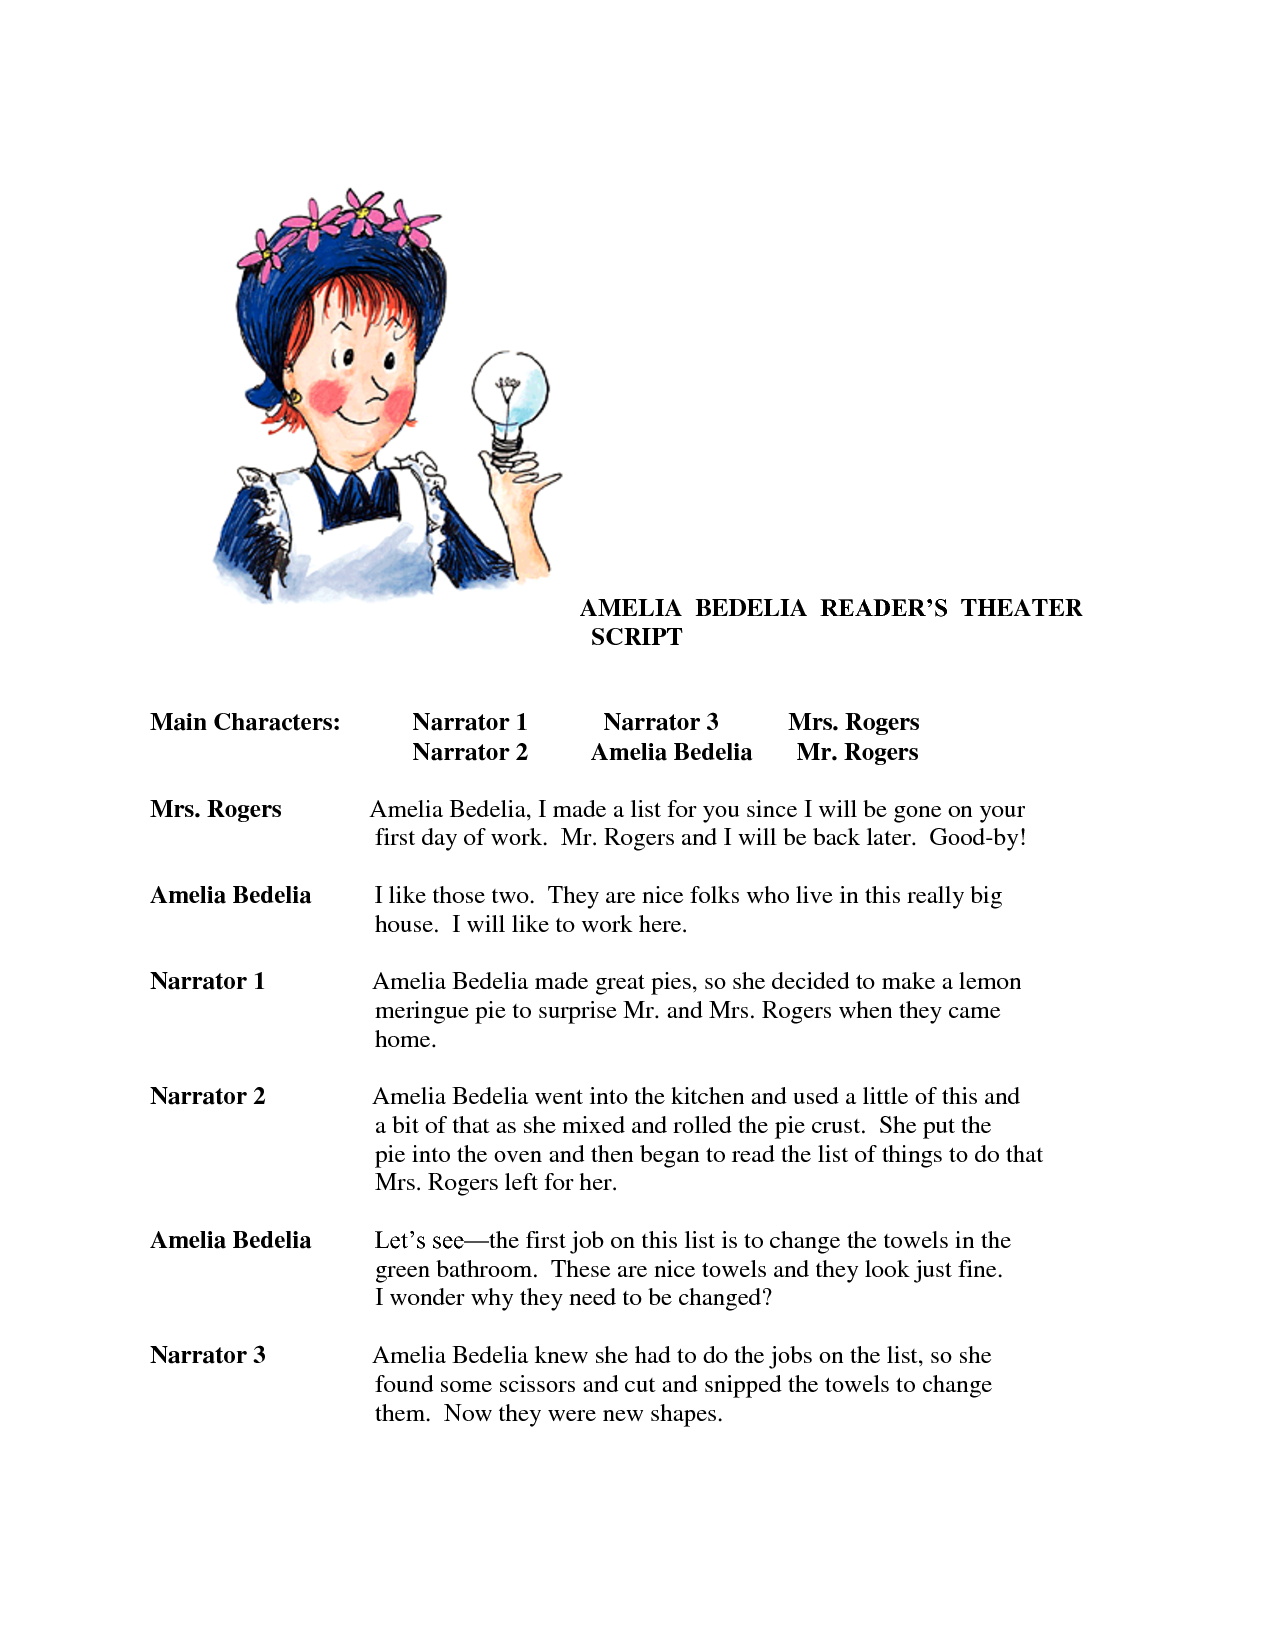 Worksheets Ameleia Bedelia